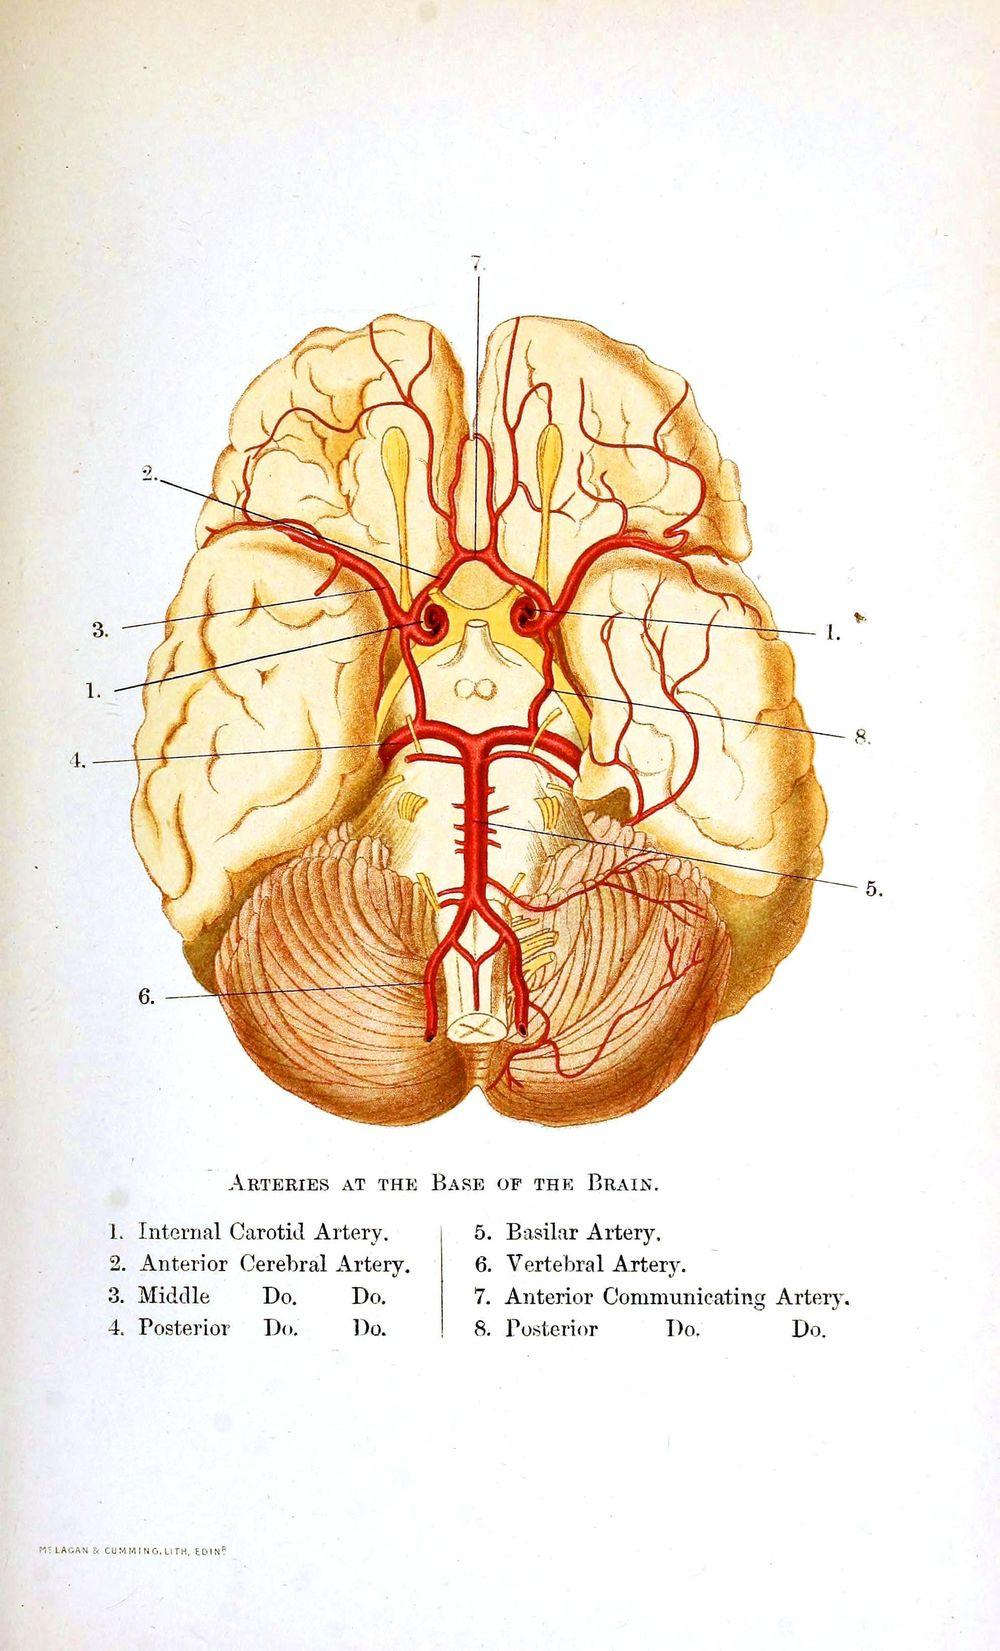 Brain Walnuts! - image 1 - student project